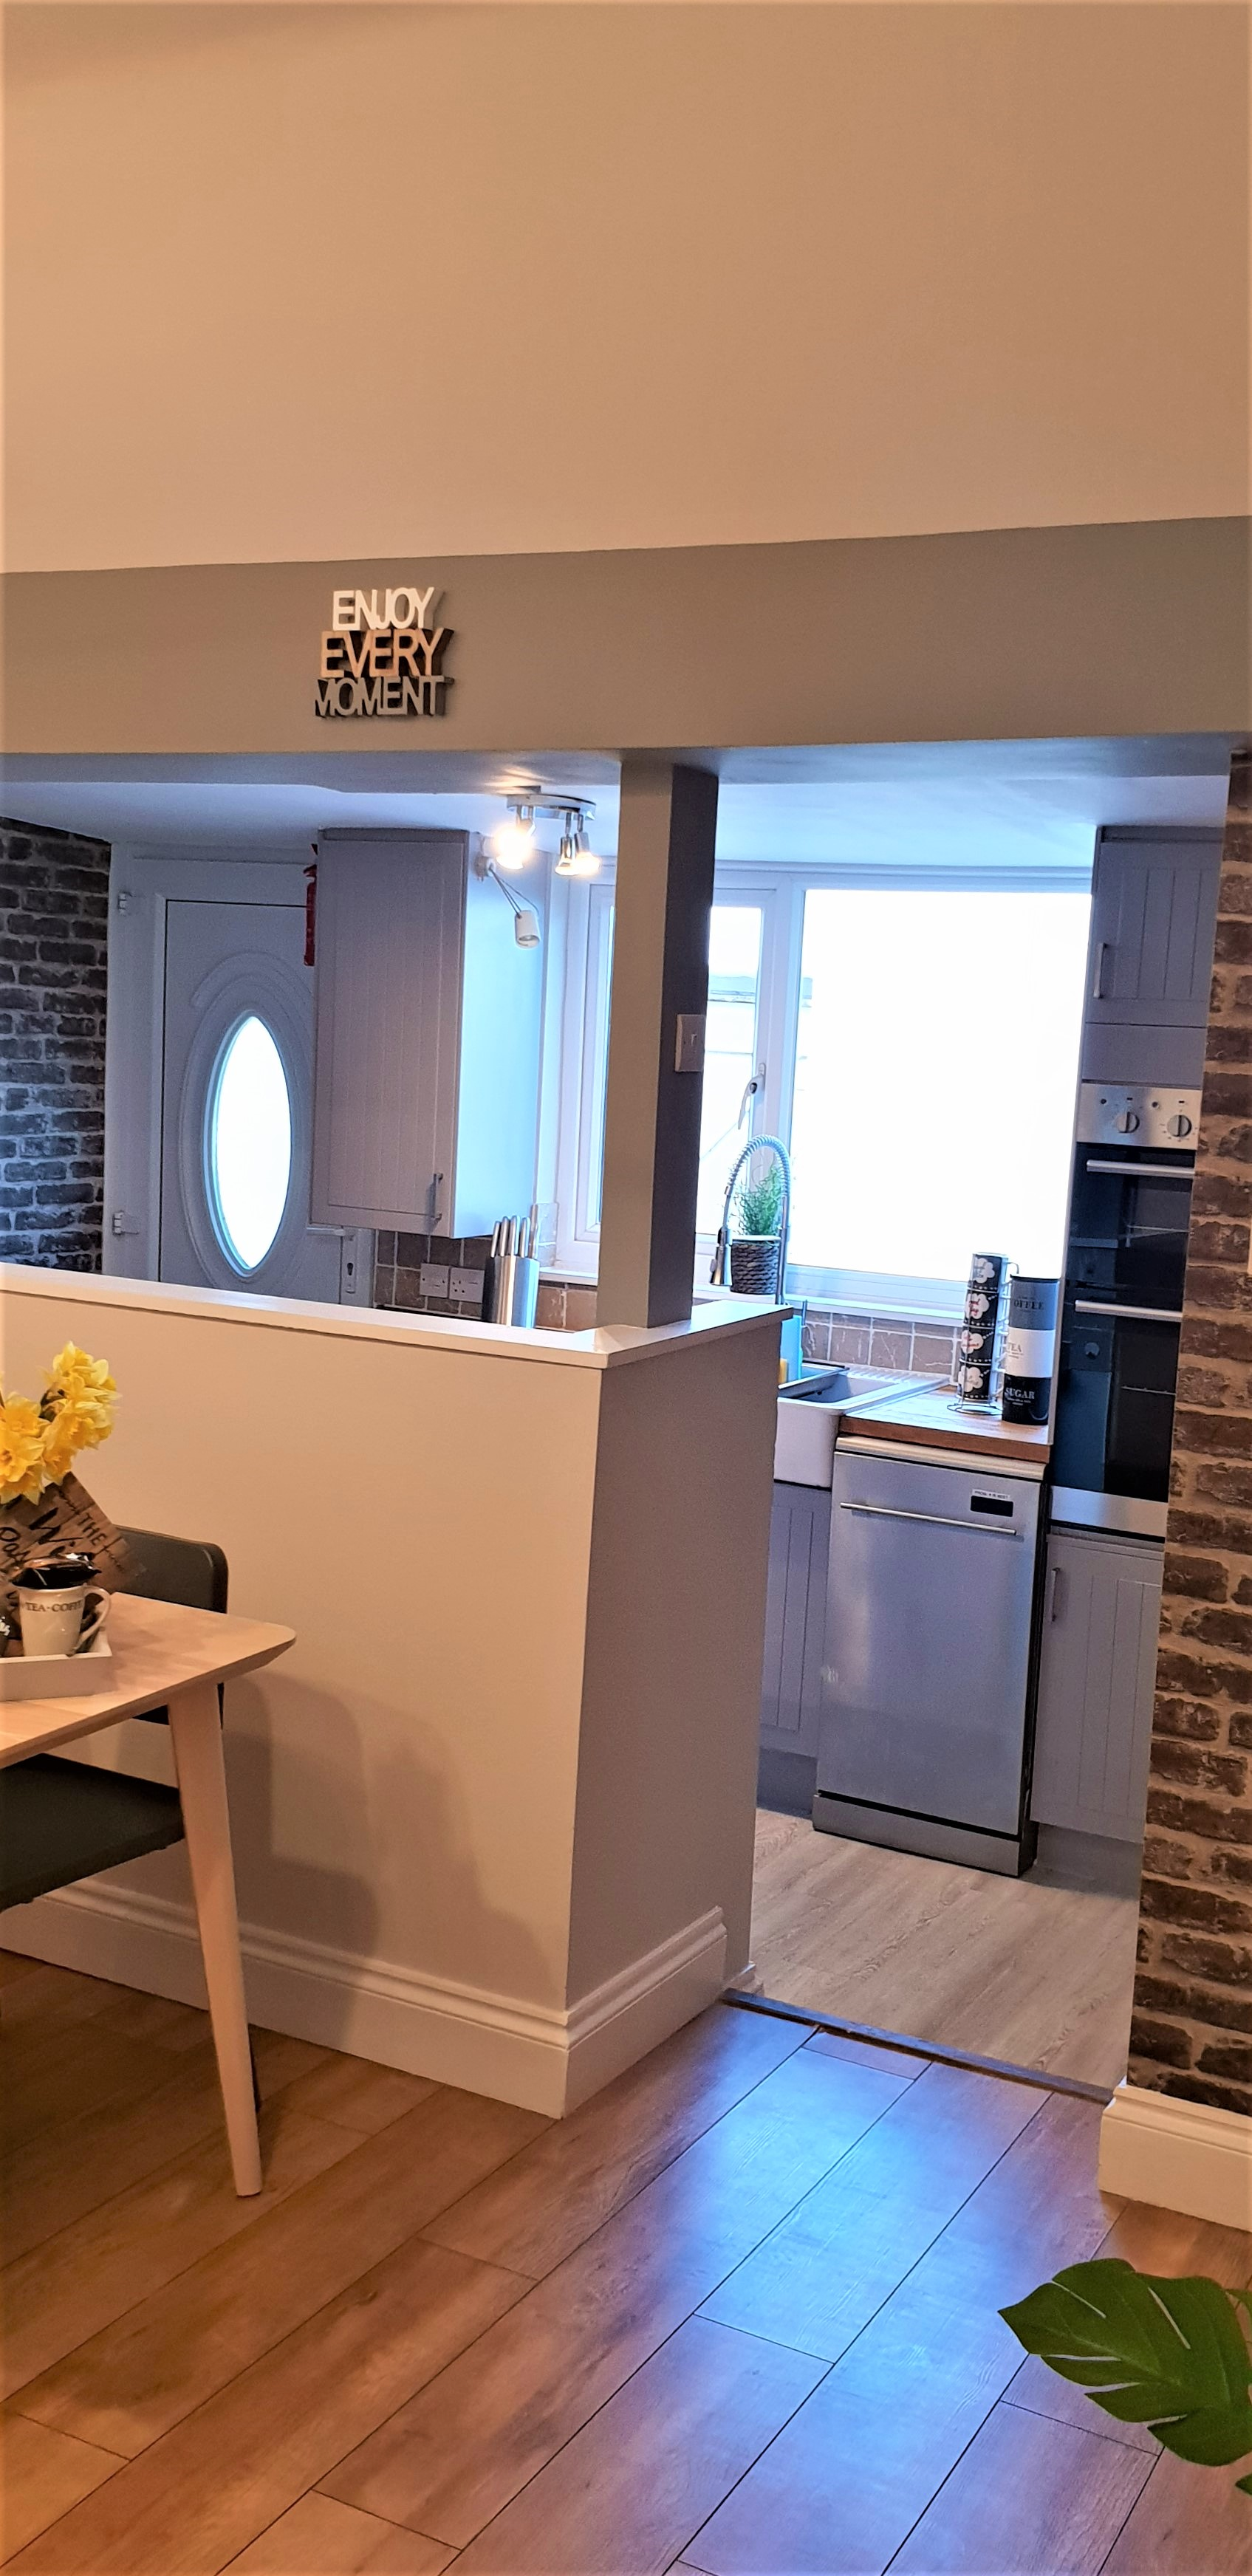 Split level kitchen diner